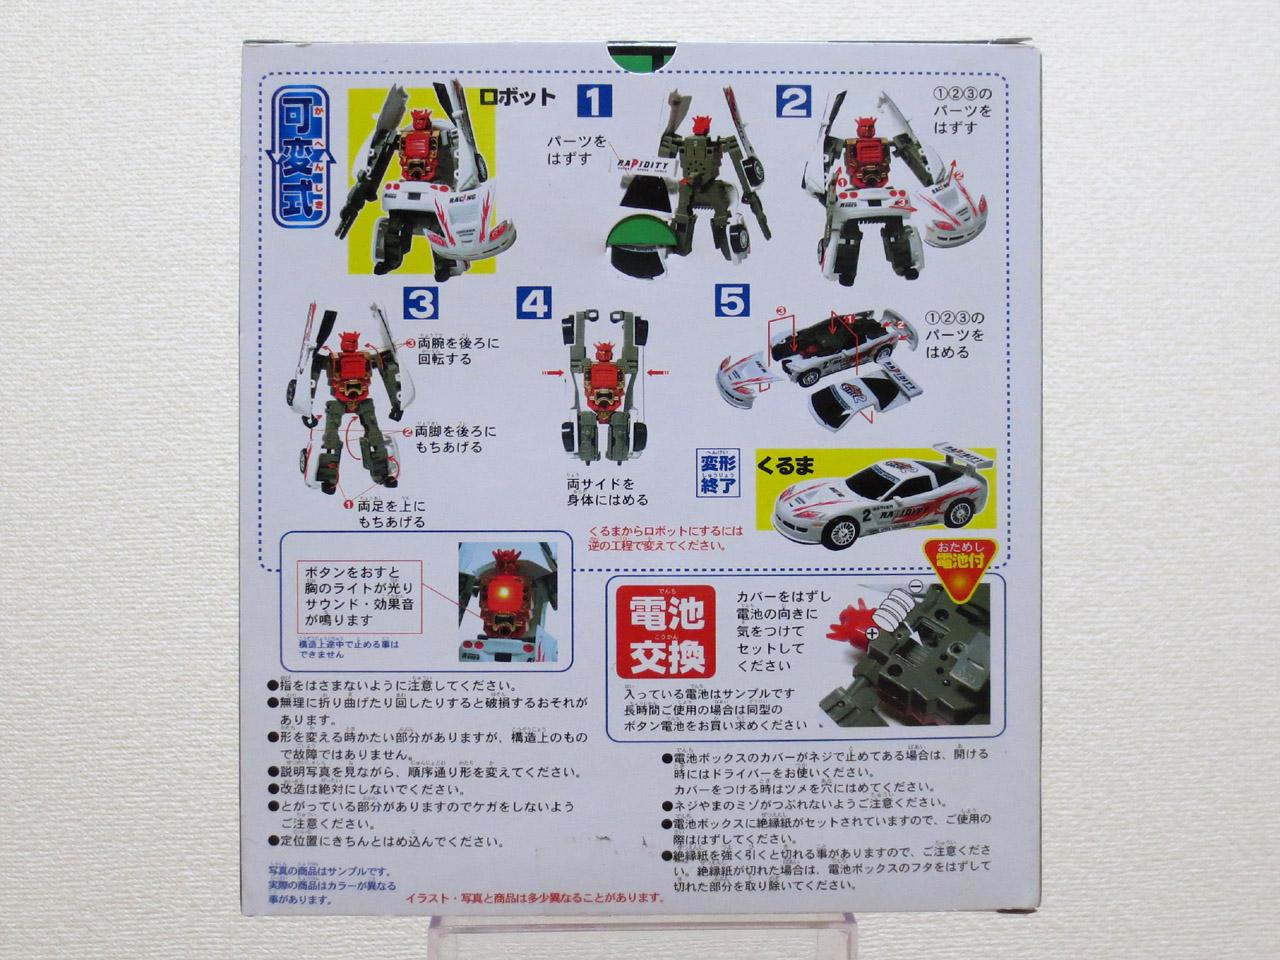 Change_Car_Robot_Doujin_02-2.jpg